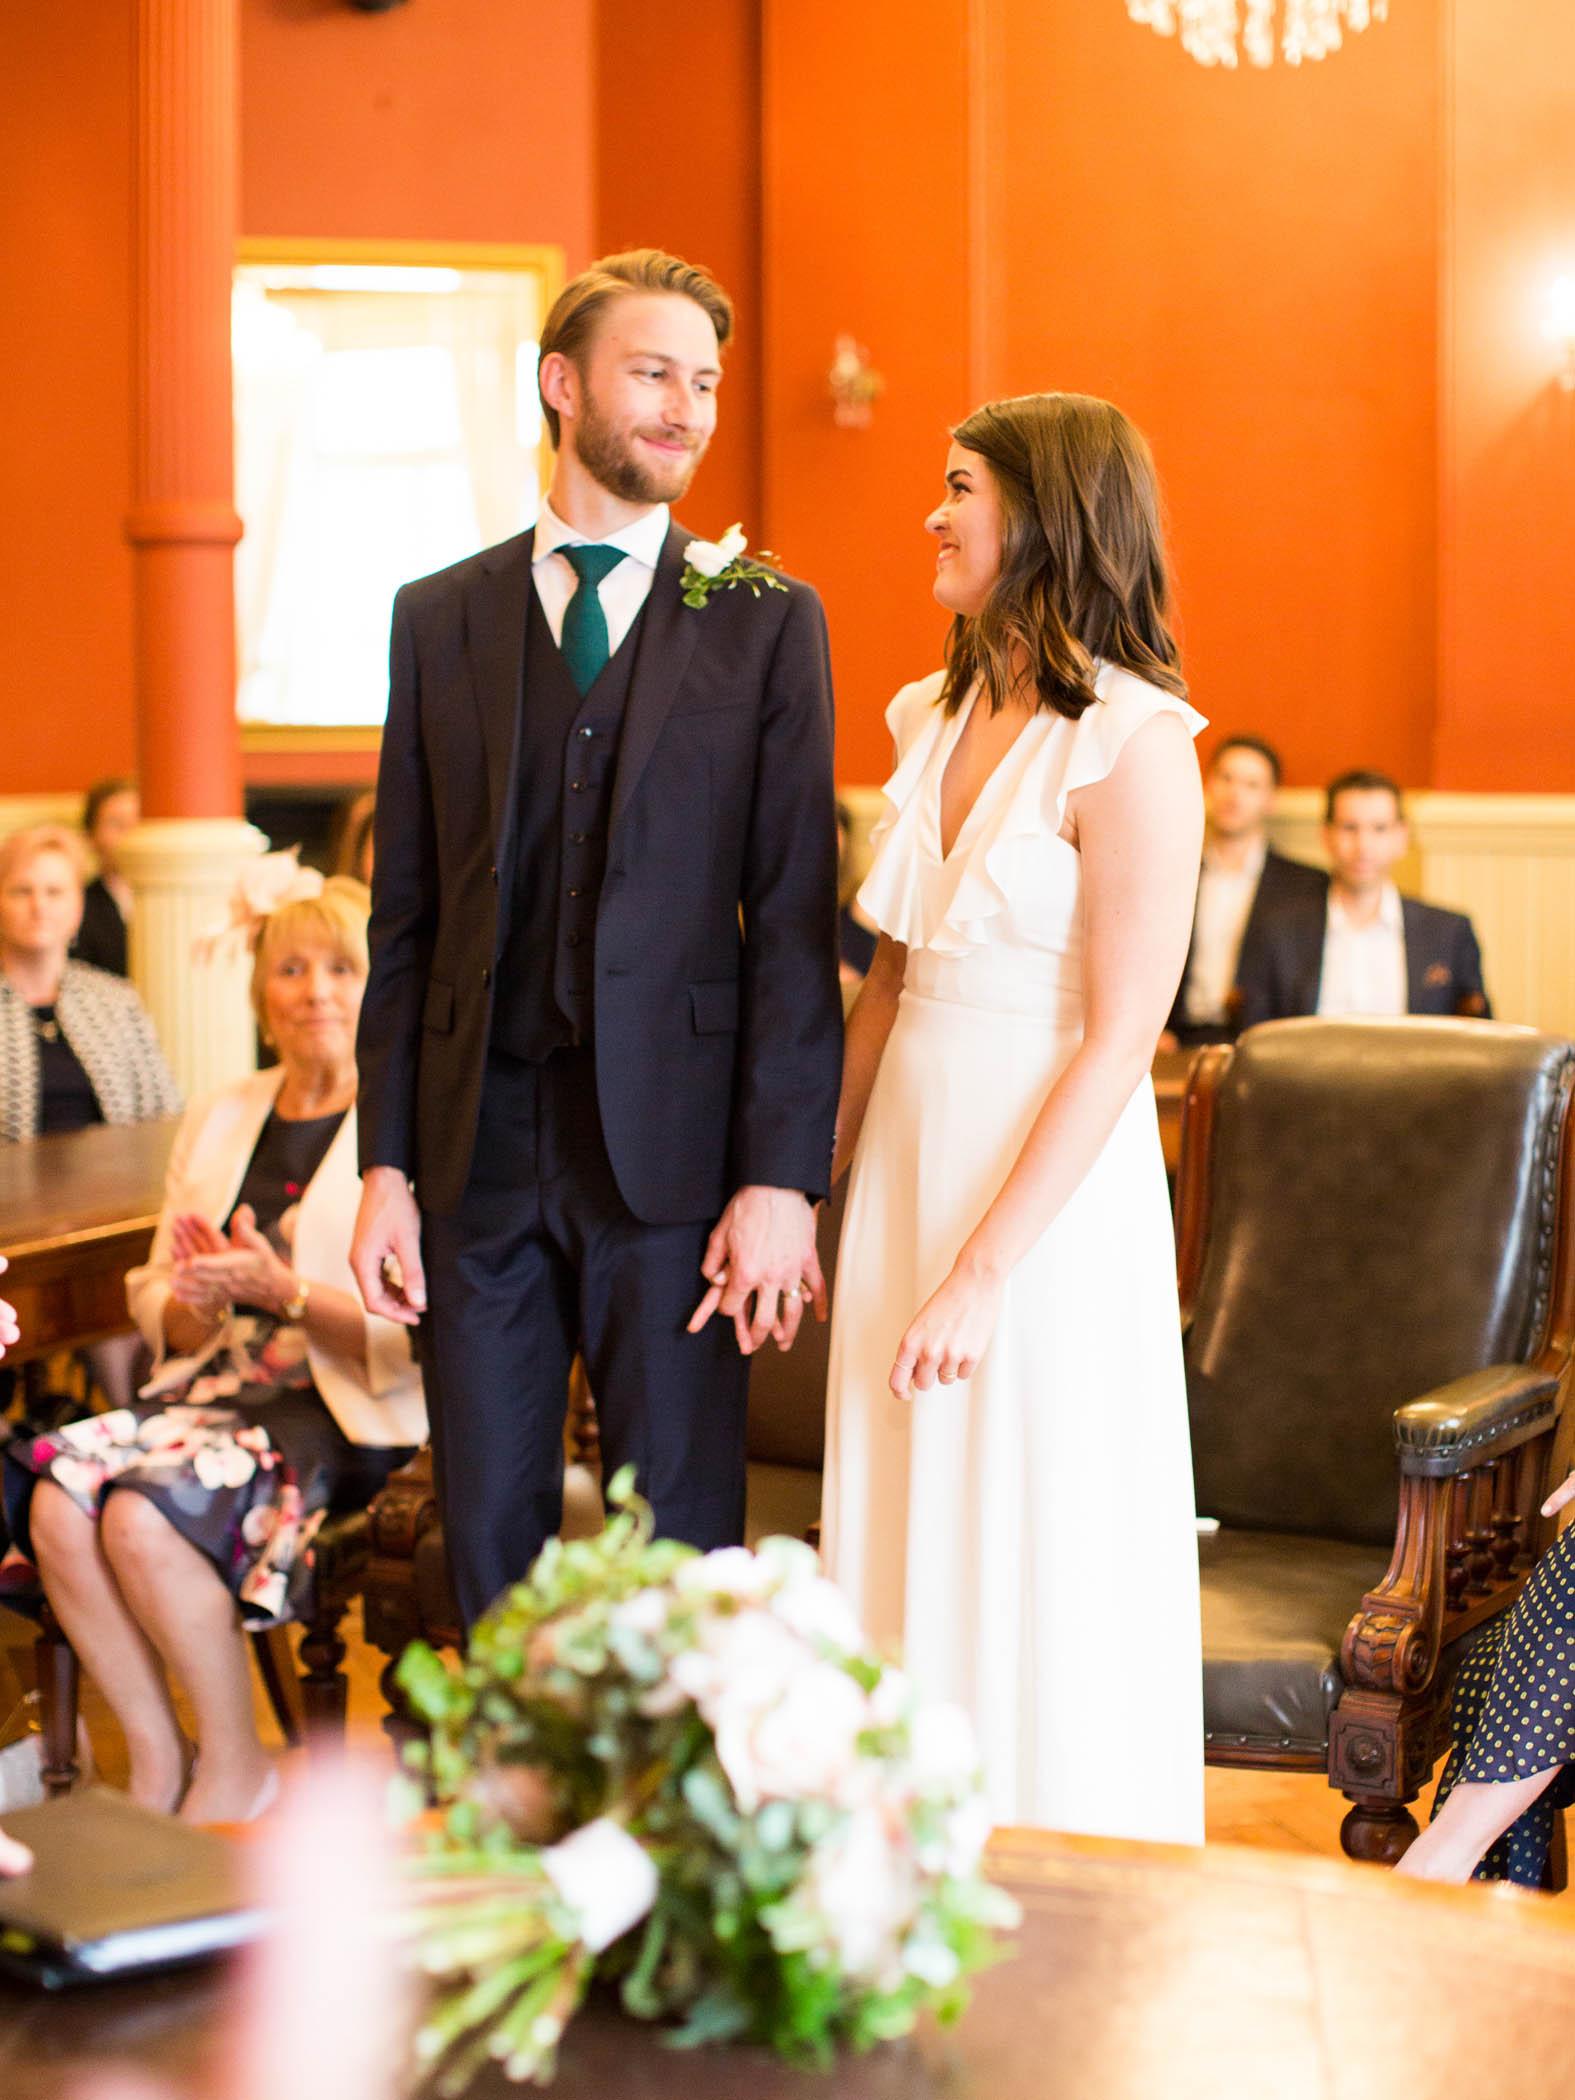 Amy O'Boyle Photography- Destination & UK Fine Art Film Wedding Photographer- The Anna Edit Wedding Brighton-23.jpg